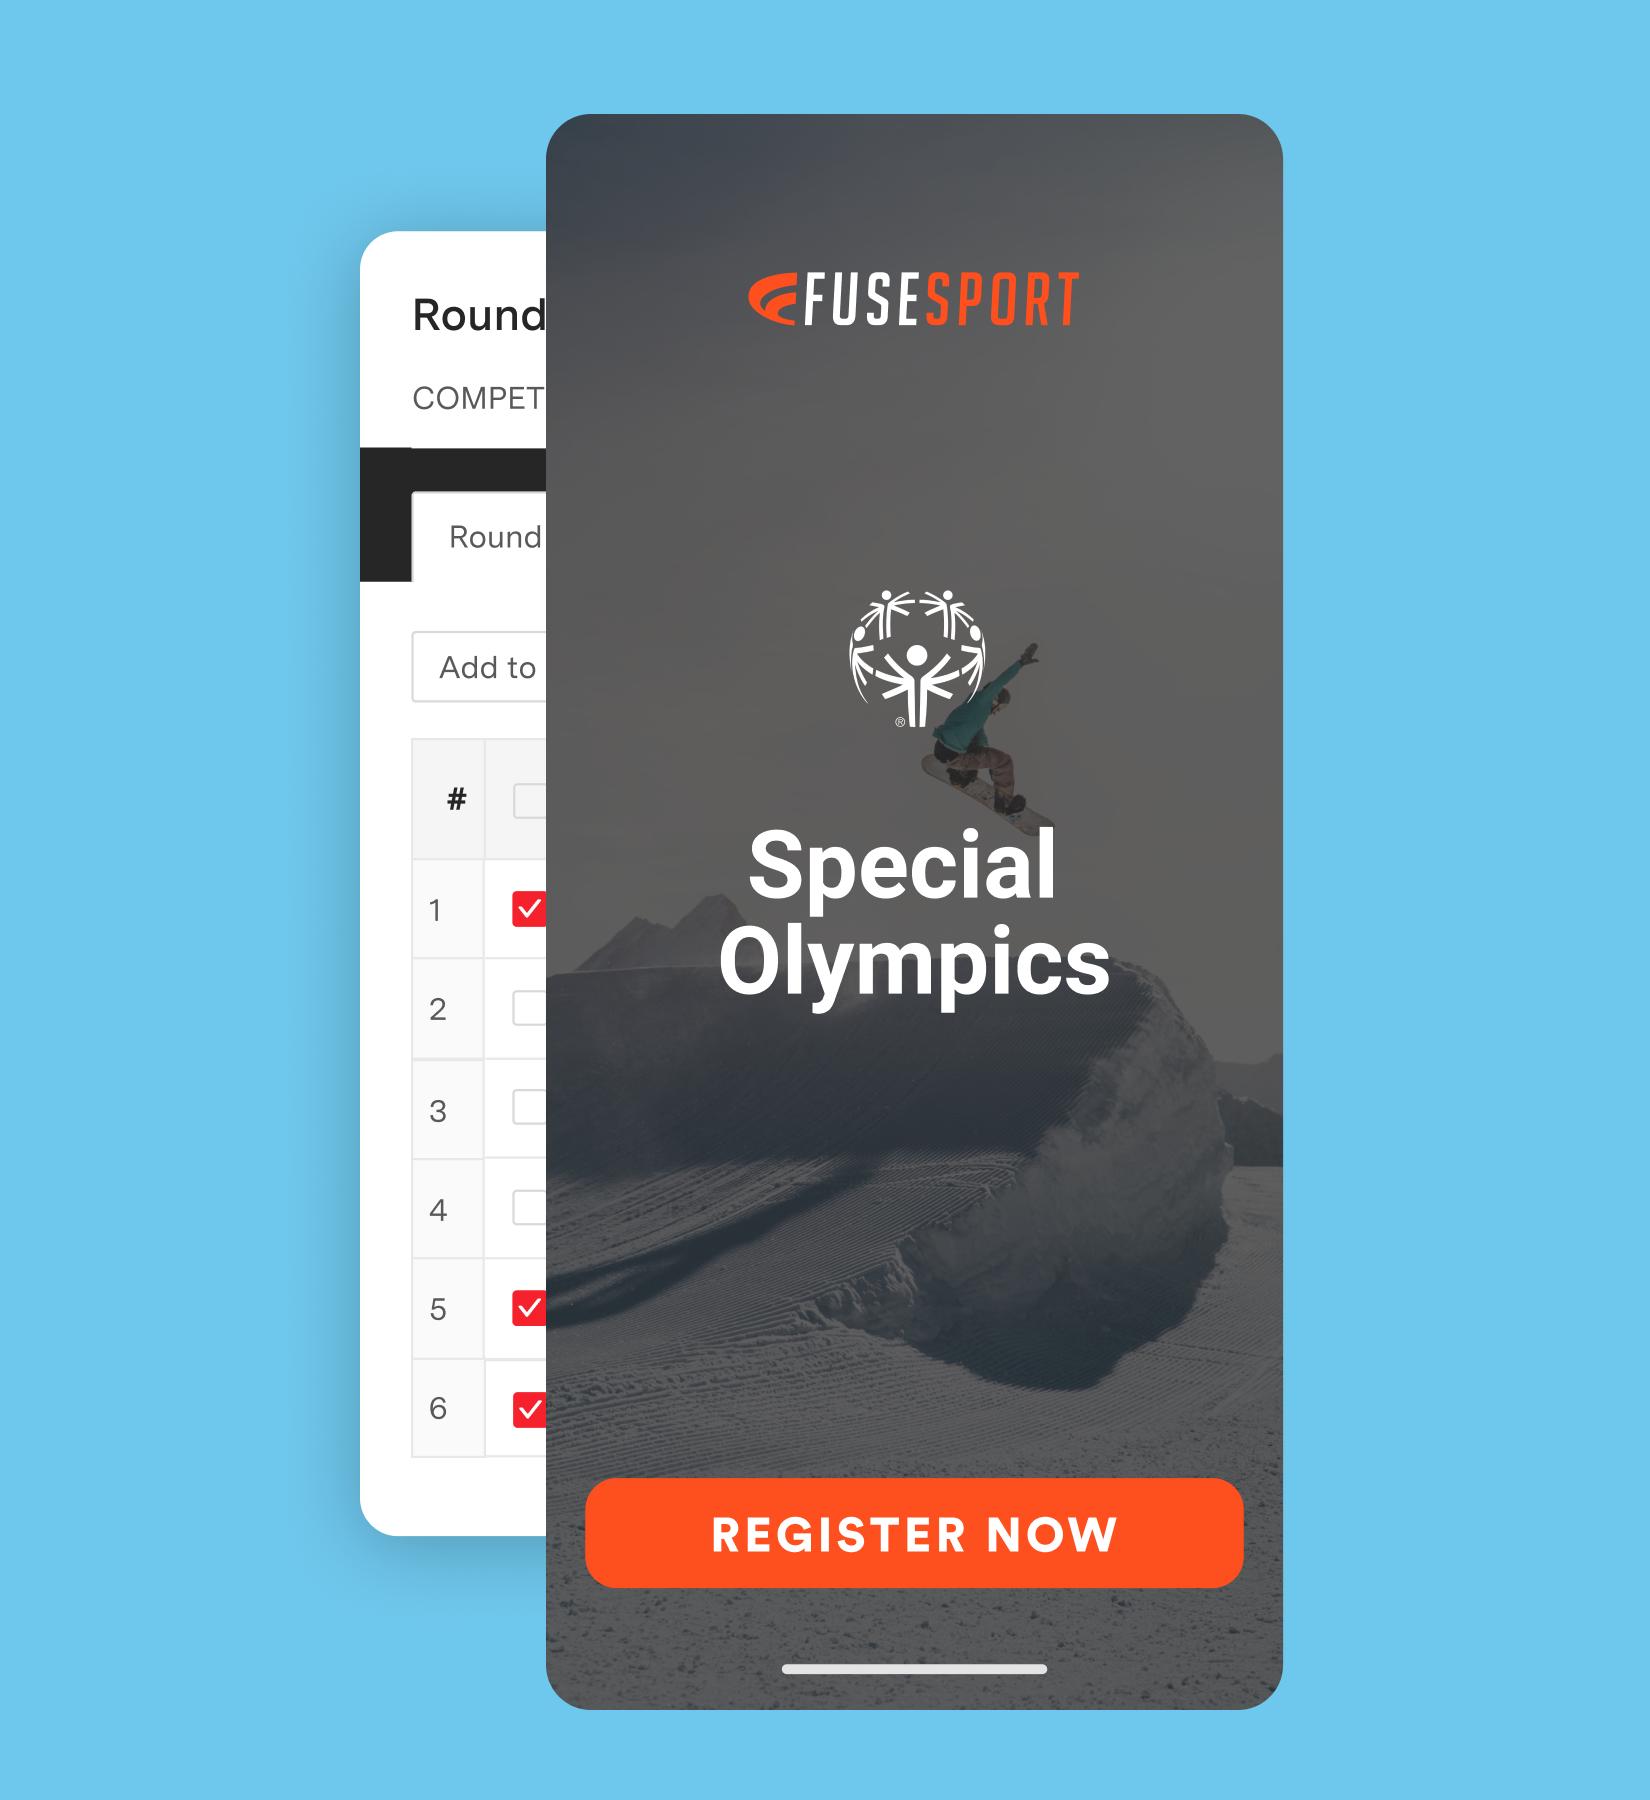 Fusesport-Sports Management Platform